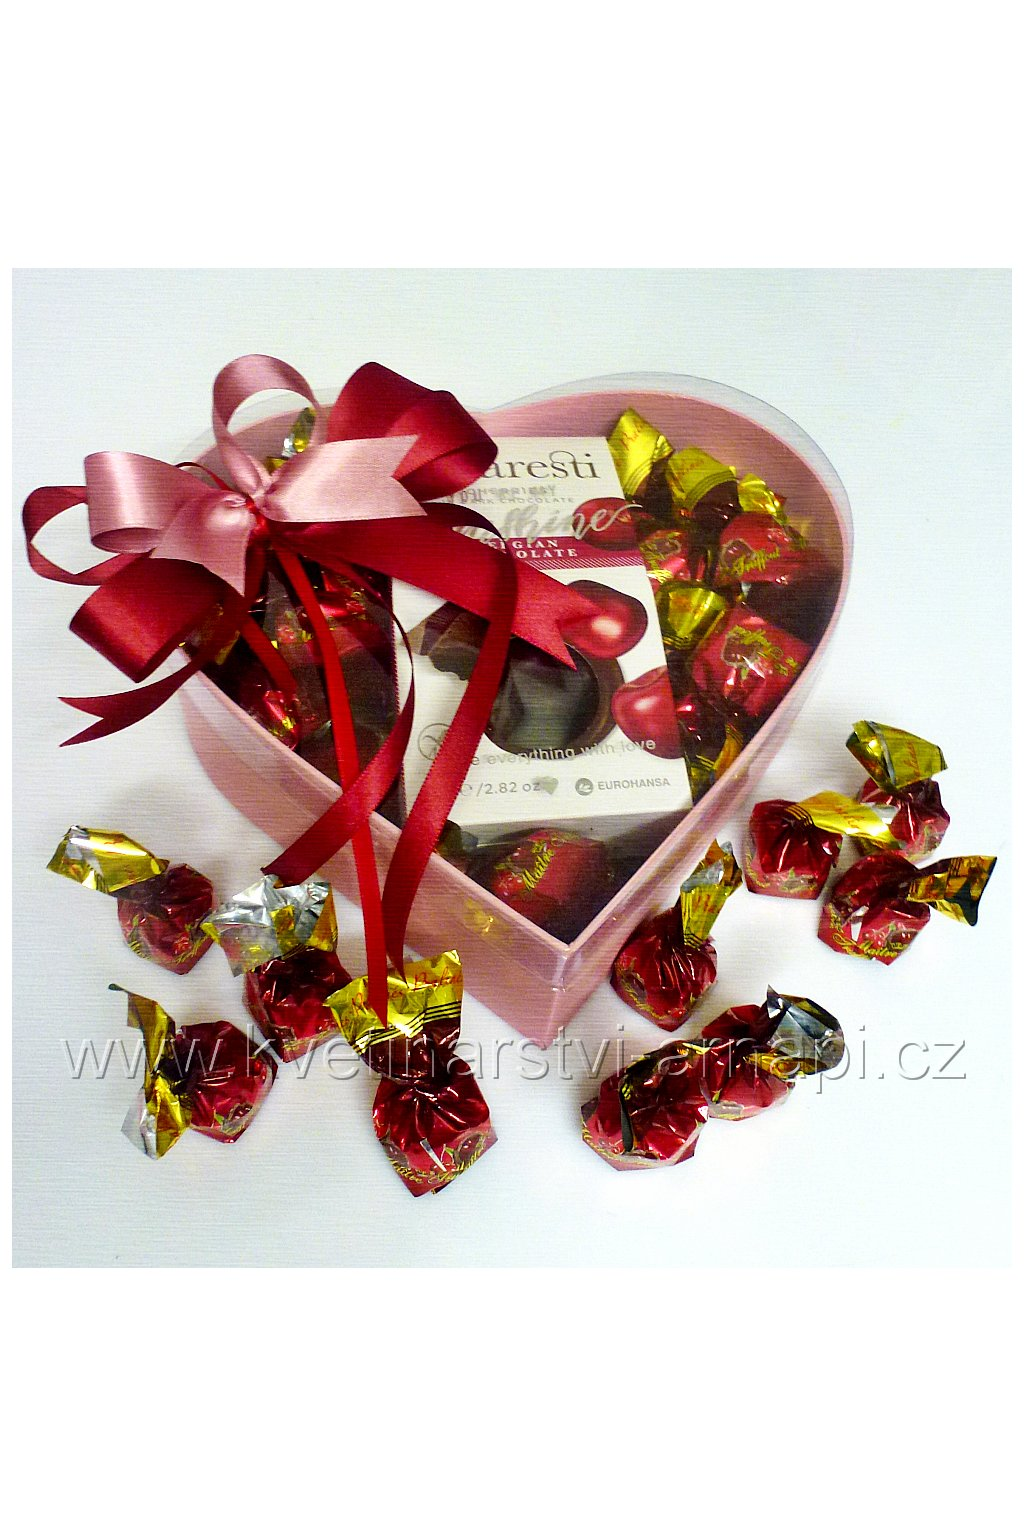 srdce z cokoladovych pralinek visne kvetinarstvi arnapi